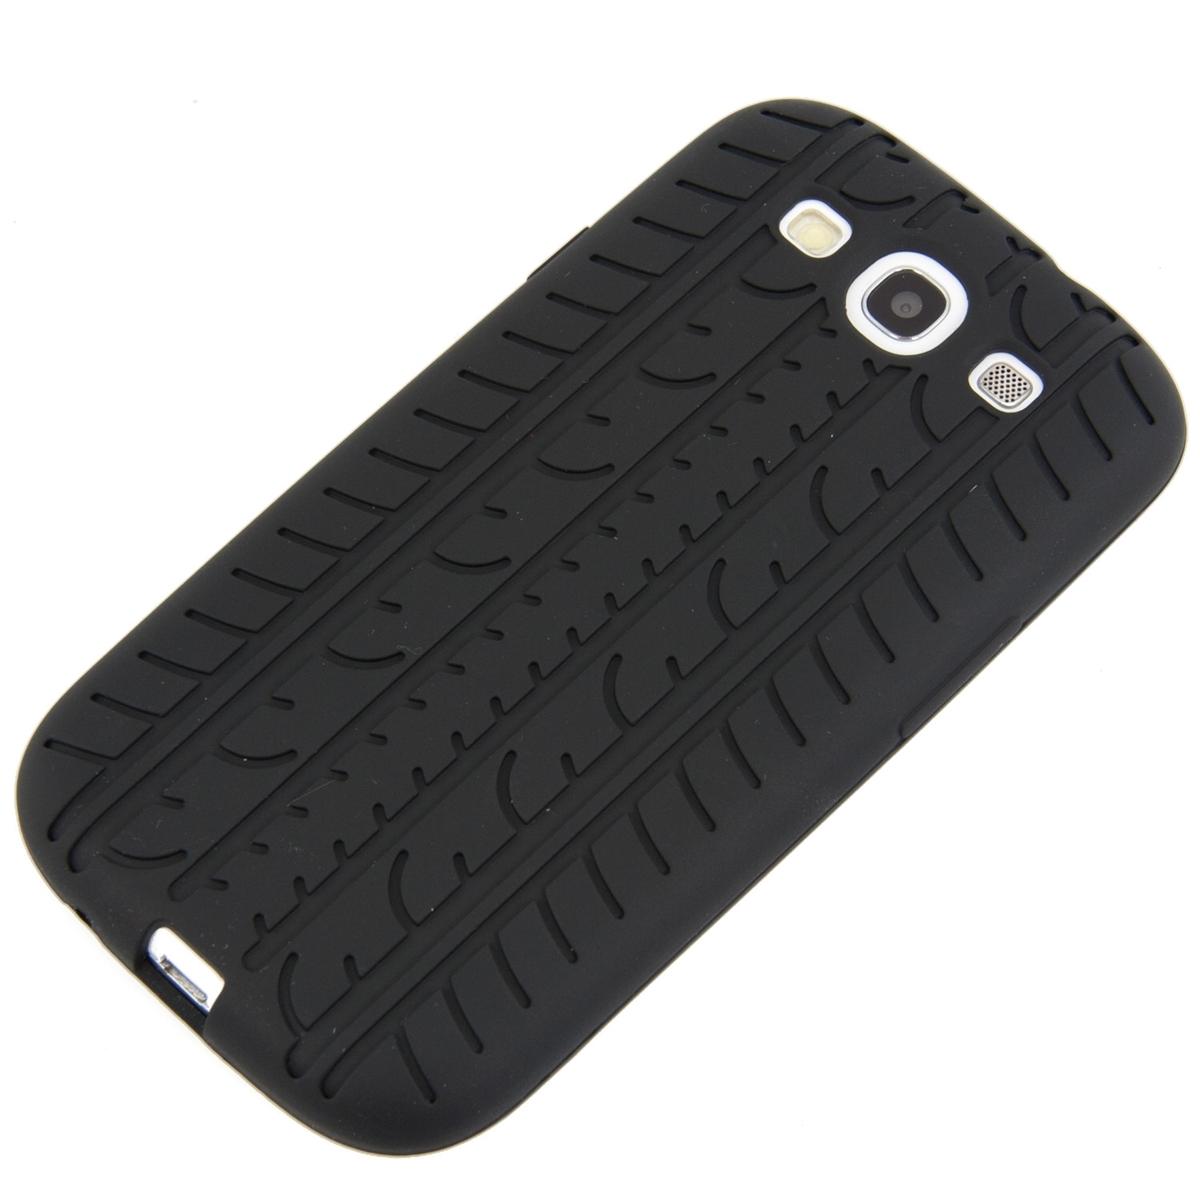 Tpu samsung galaxy s3 s3 neo - Kwmobile High Quality Wheel Case For Samsung Galaxy S3 S3 Neo In Black Of Soft Tpu